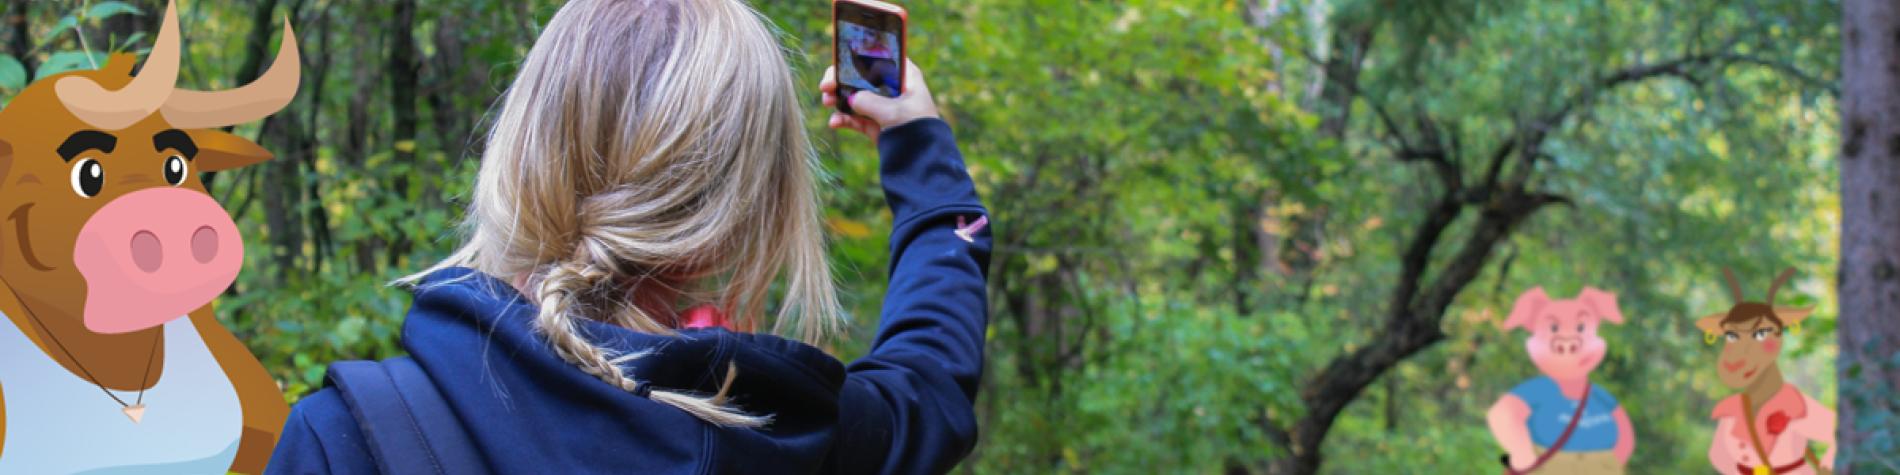 Petite fille avec son smartphone à la campagne